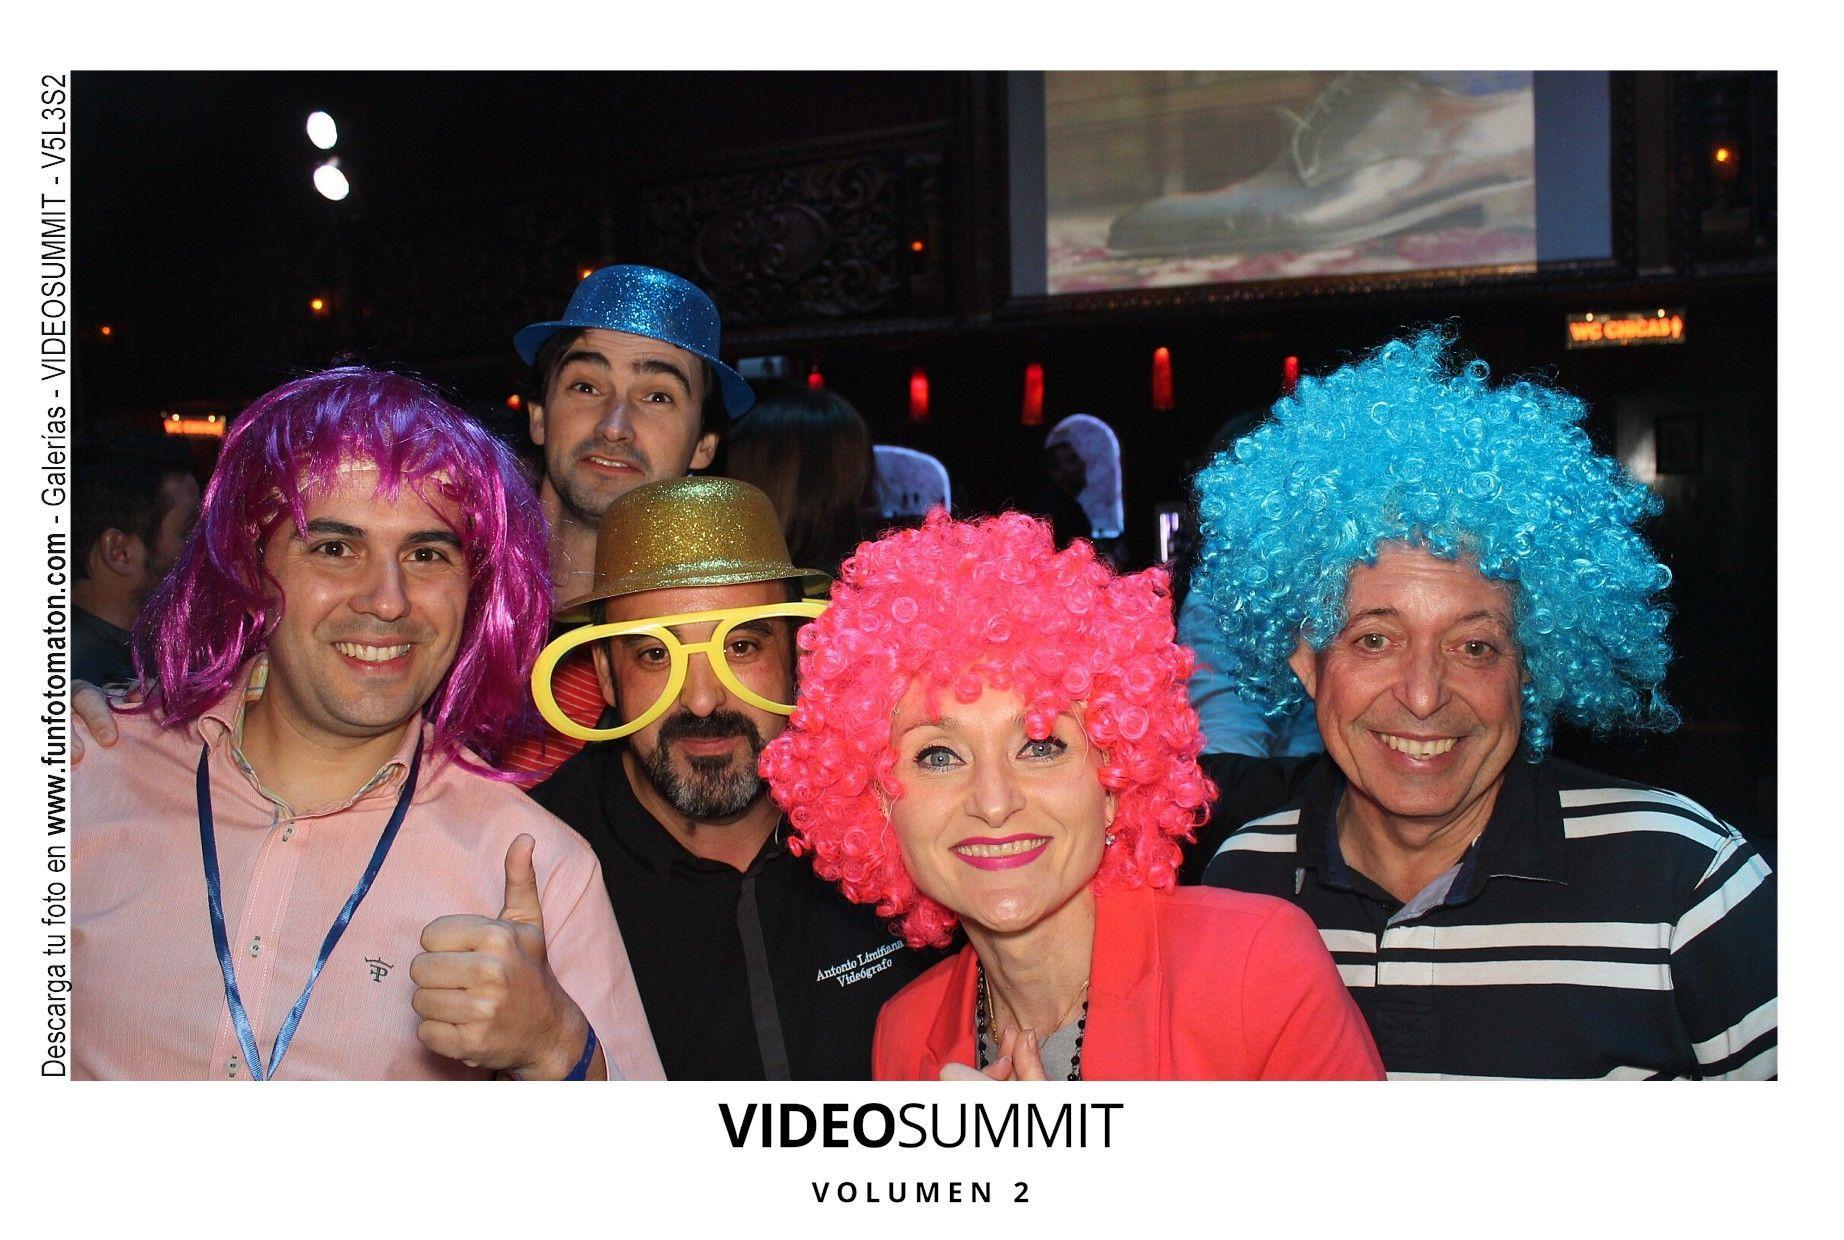 videosummit-vol2-club-party-072